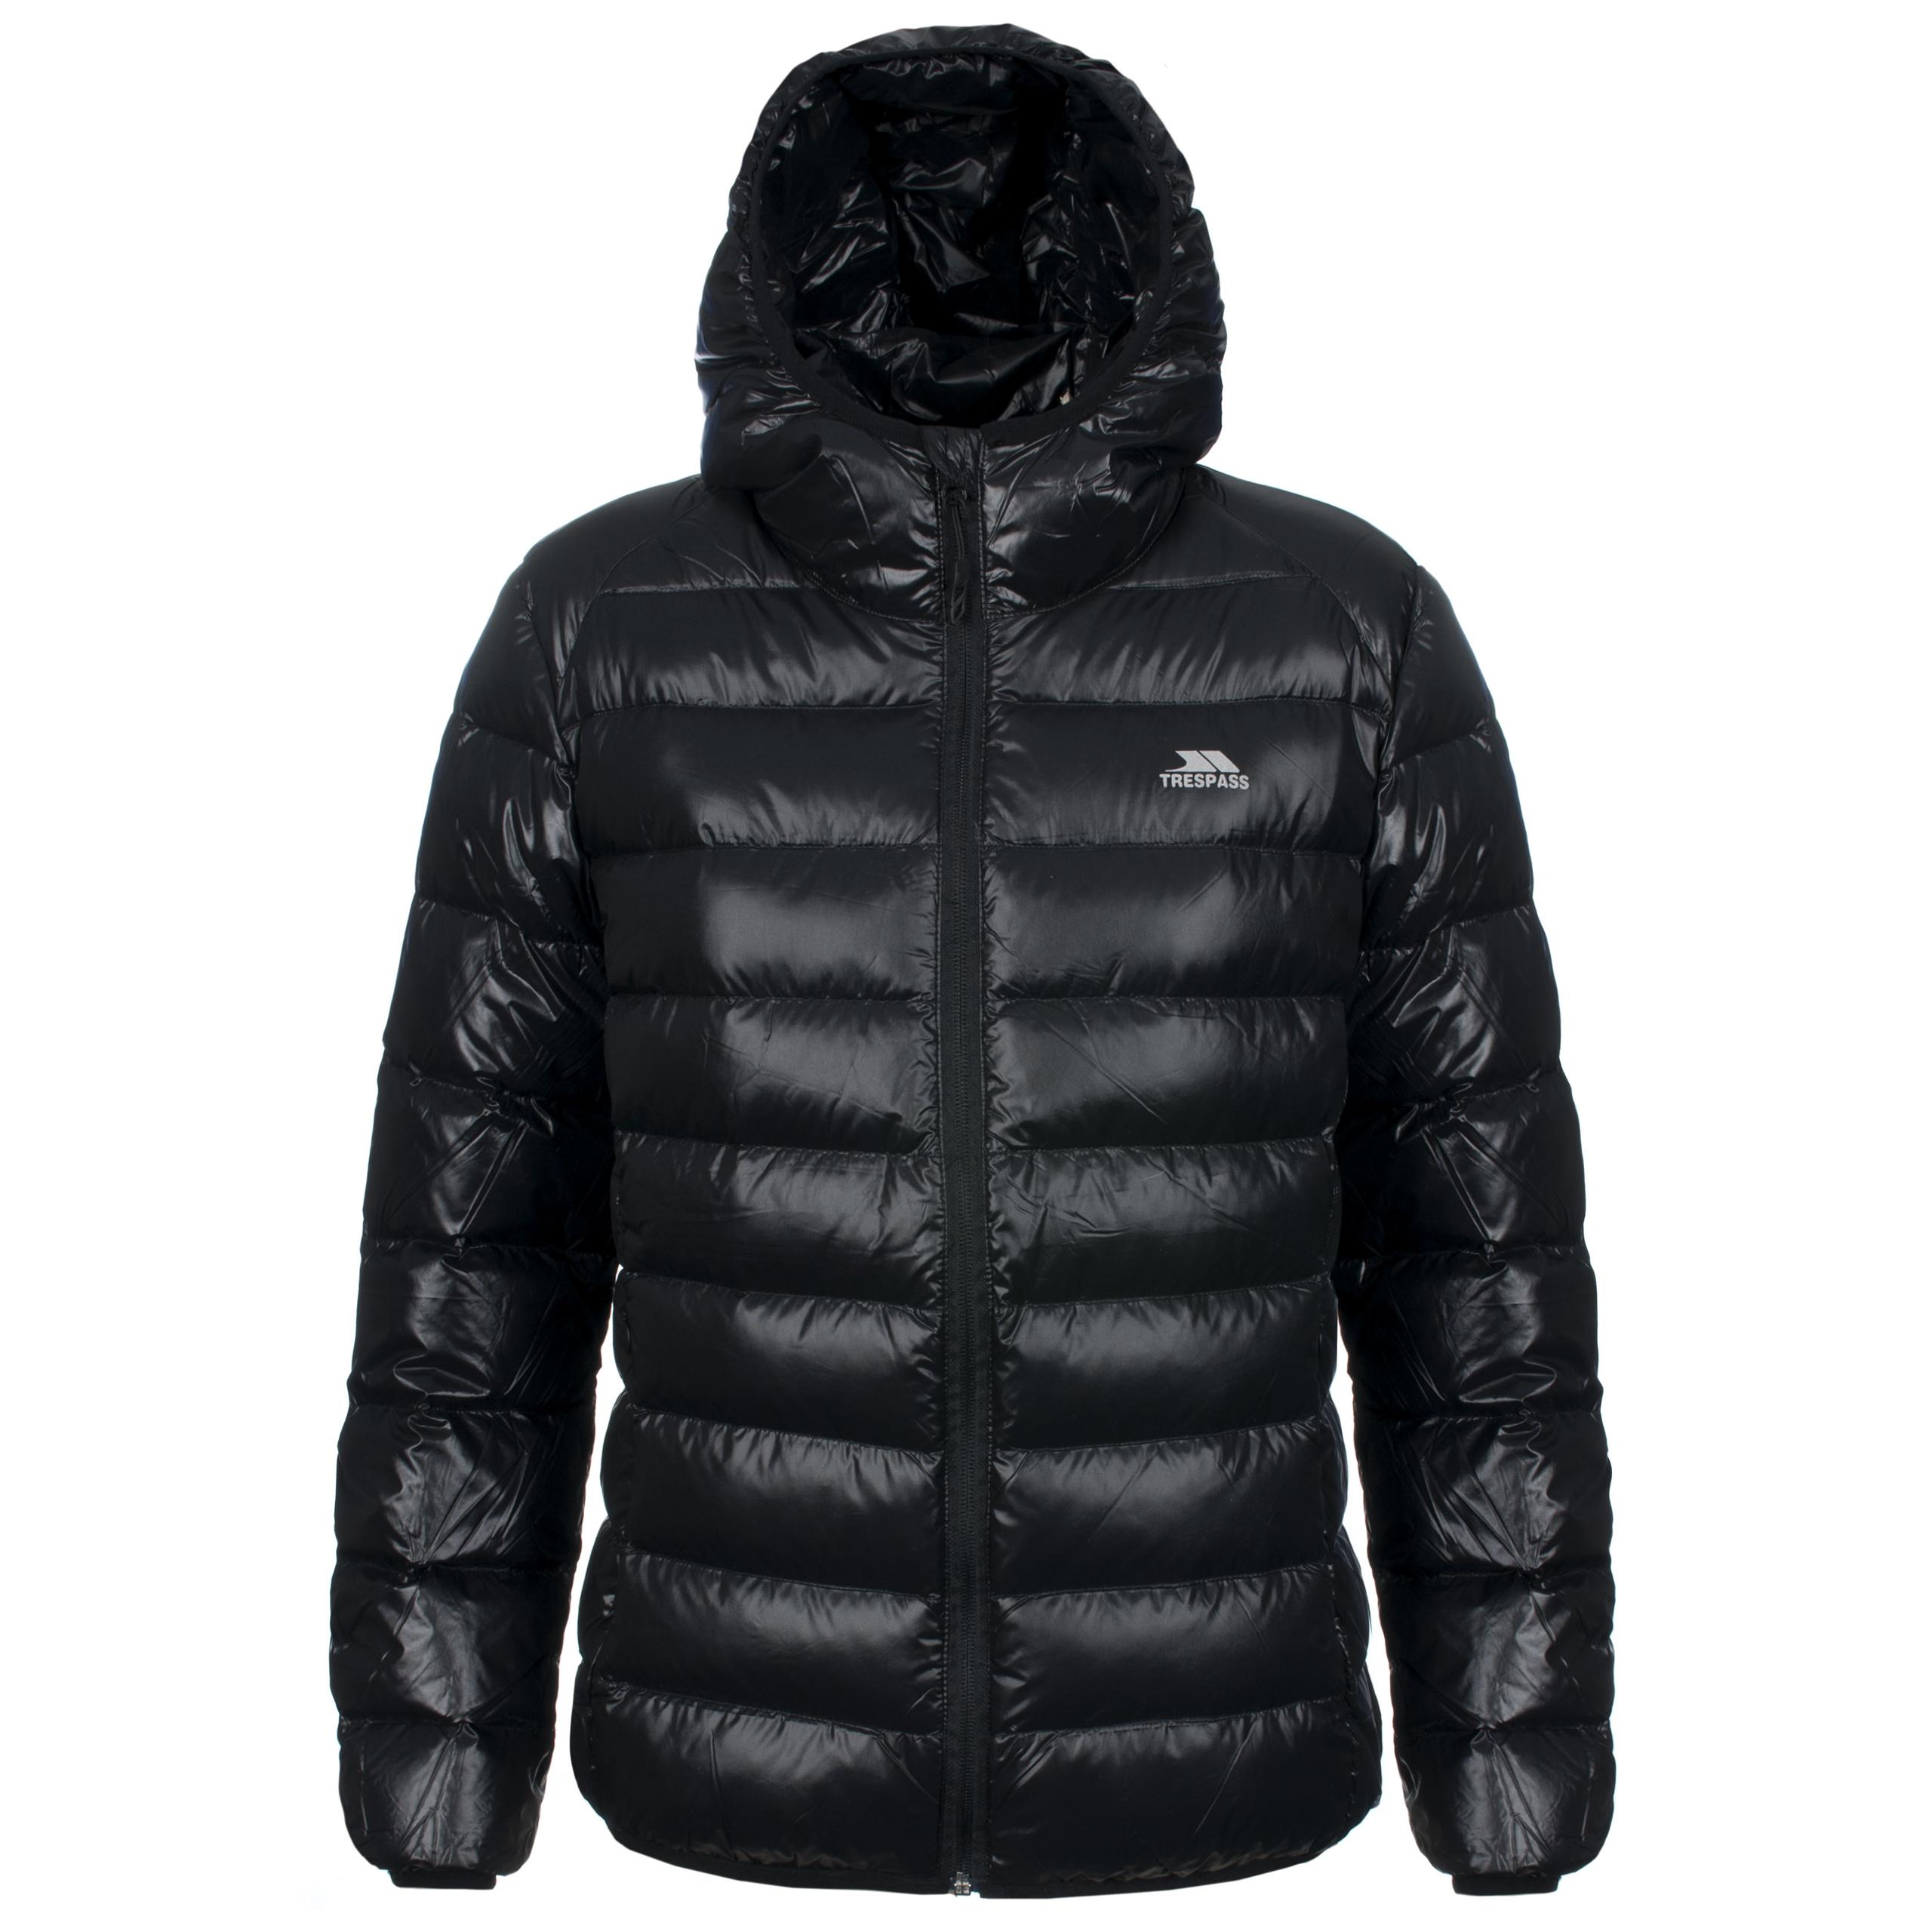 Trespass MARTINE Womens Ladies Hooded Winter Down Coat Jacket | eBay